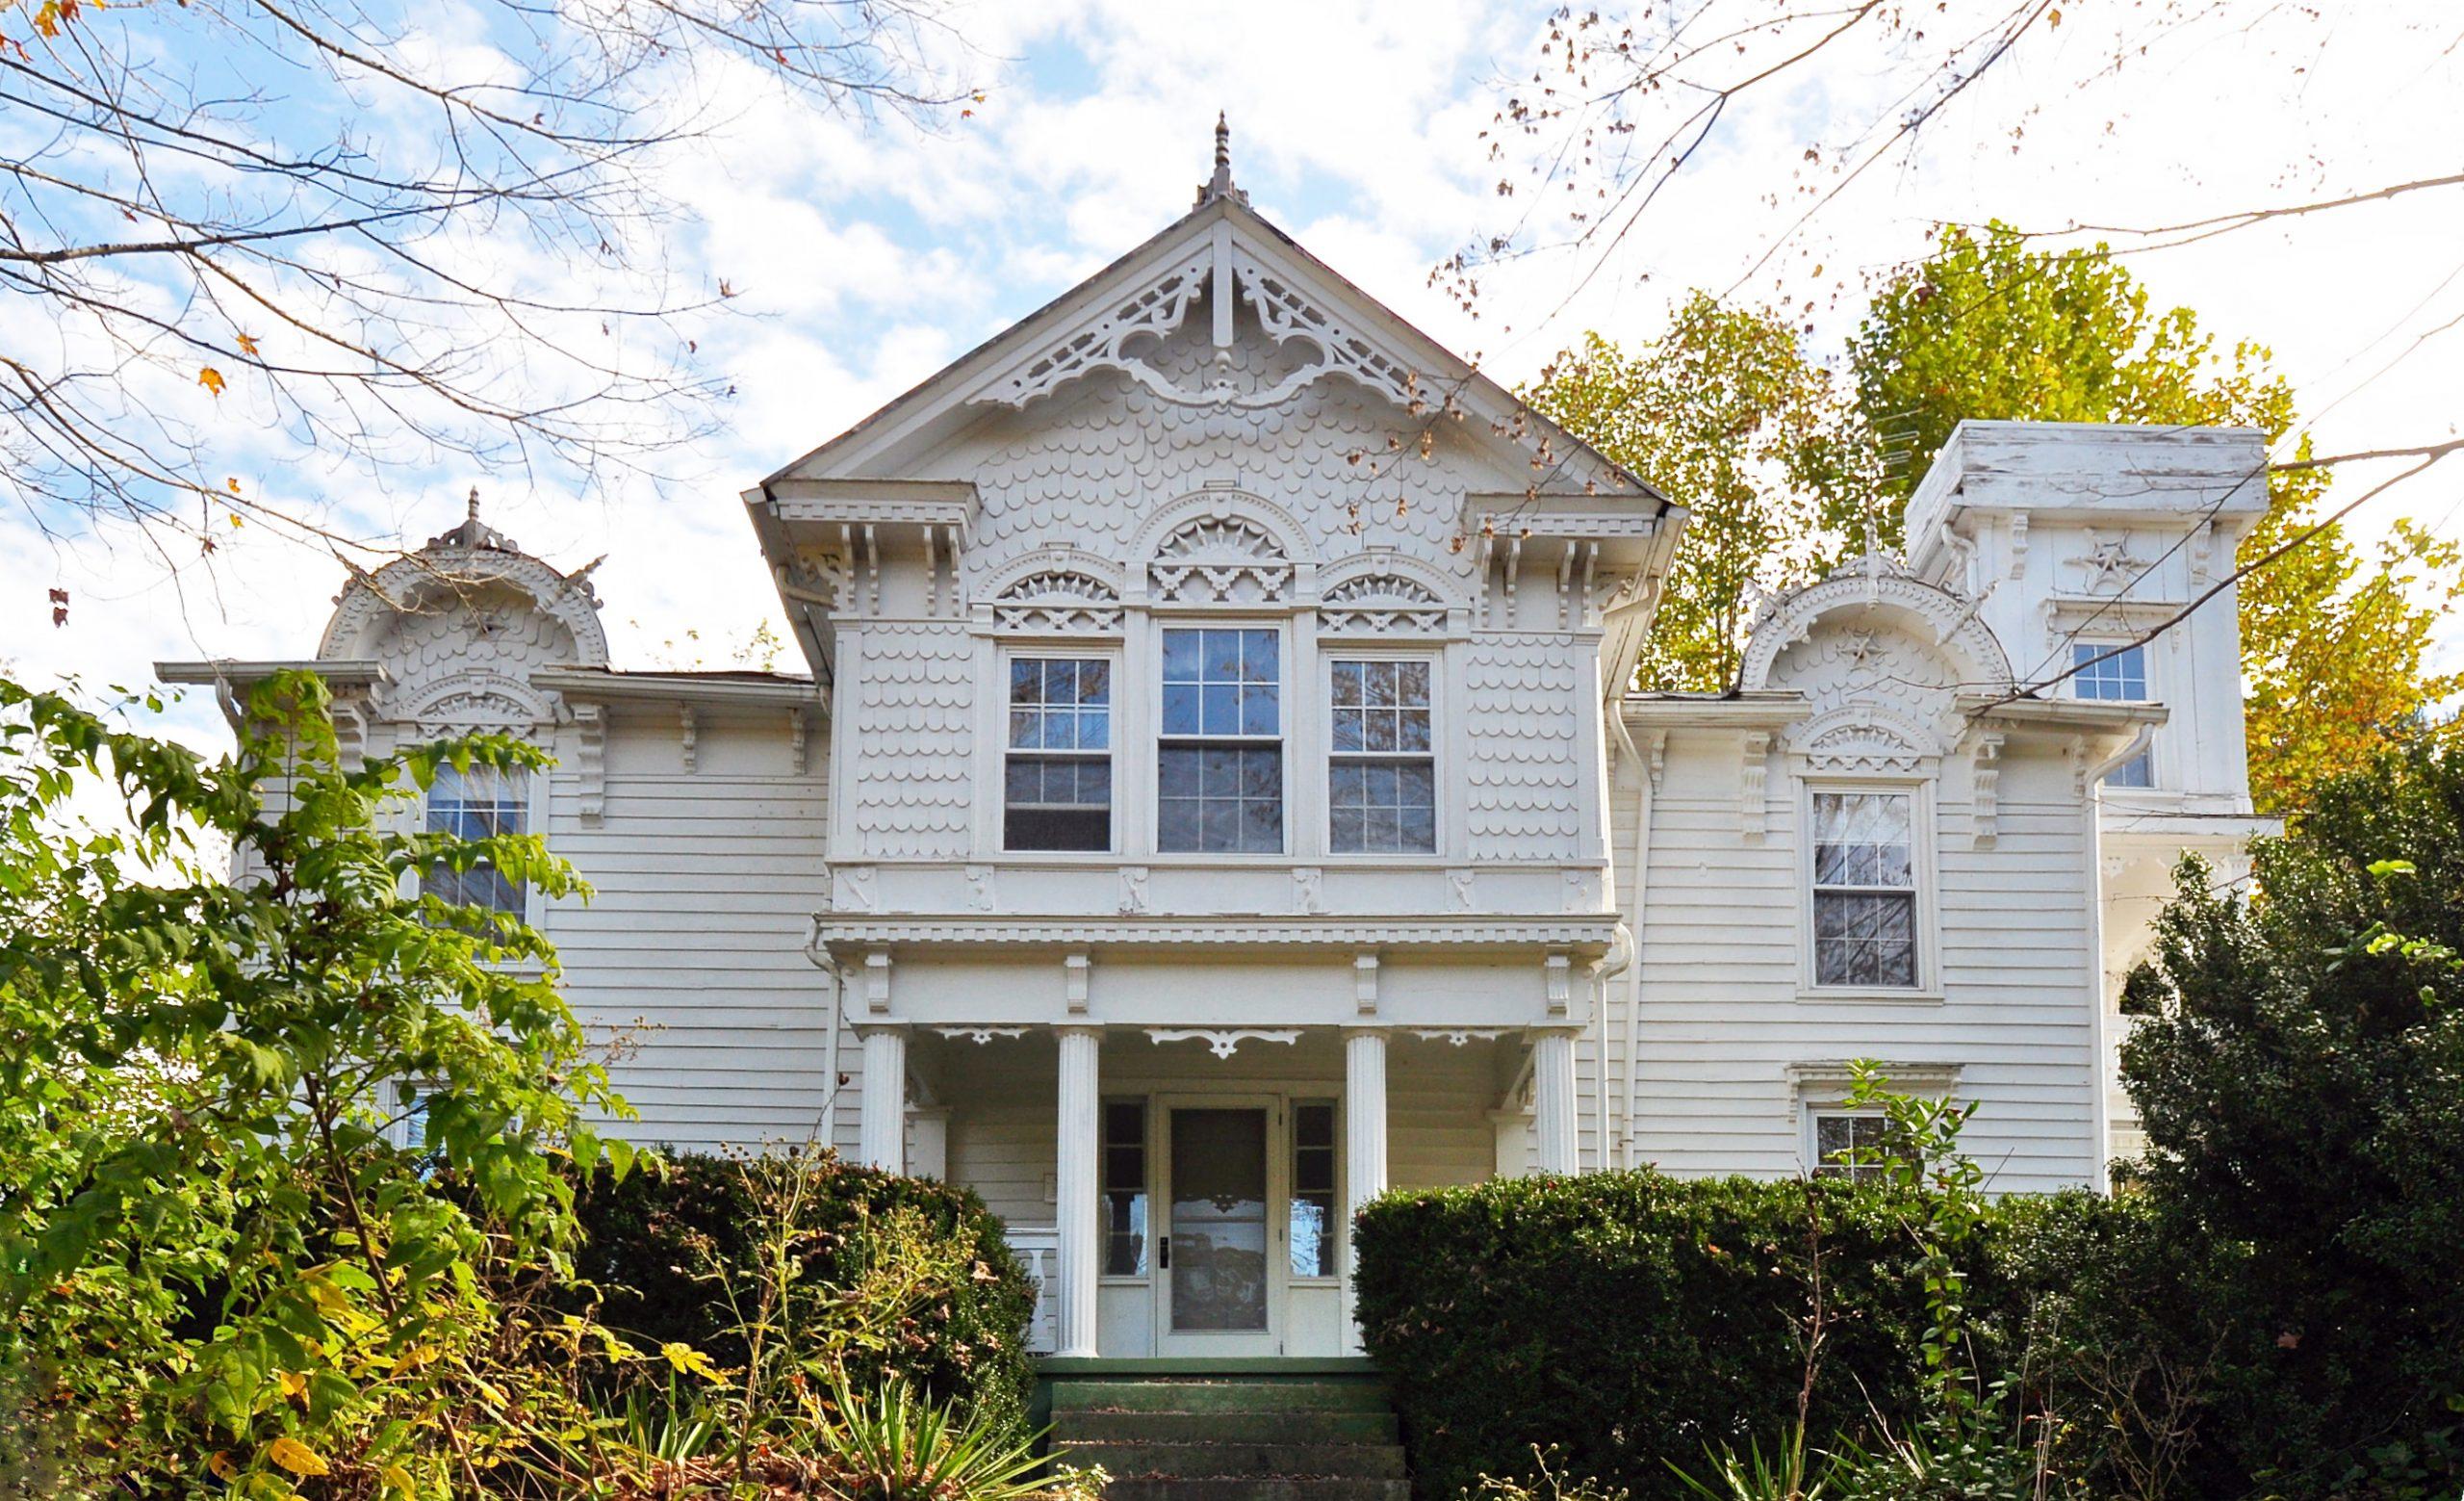 Grayson-Gravely House